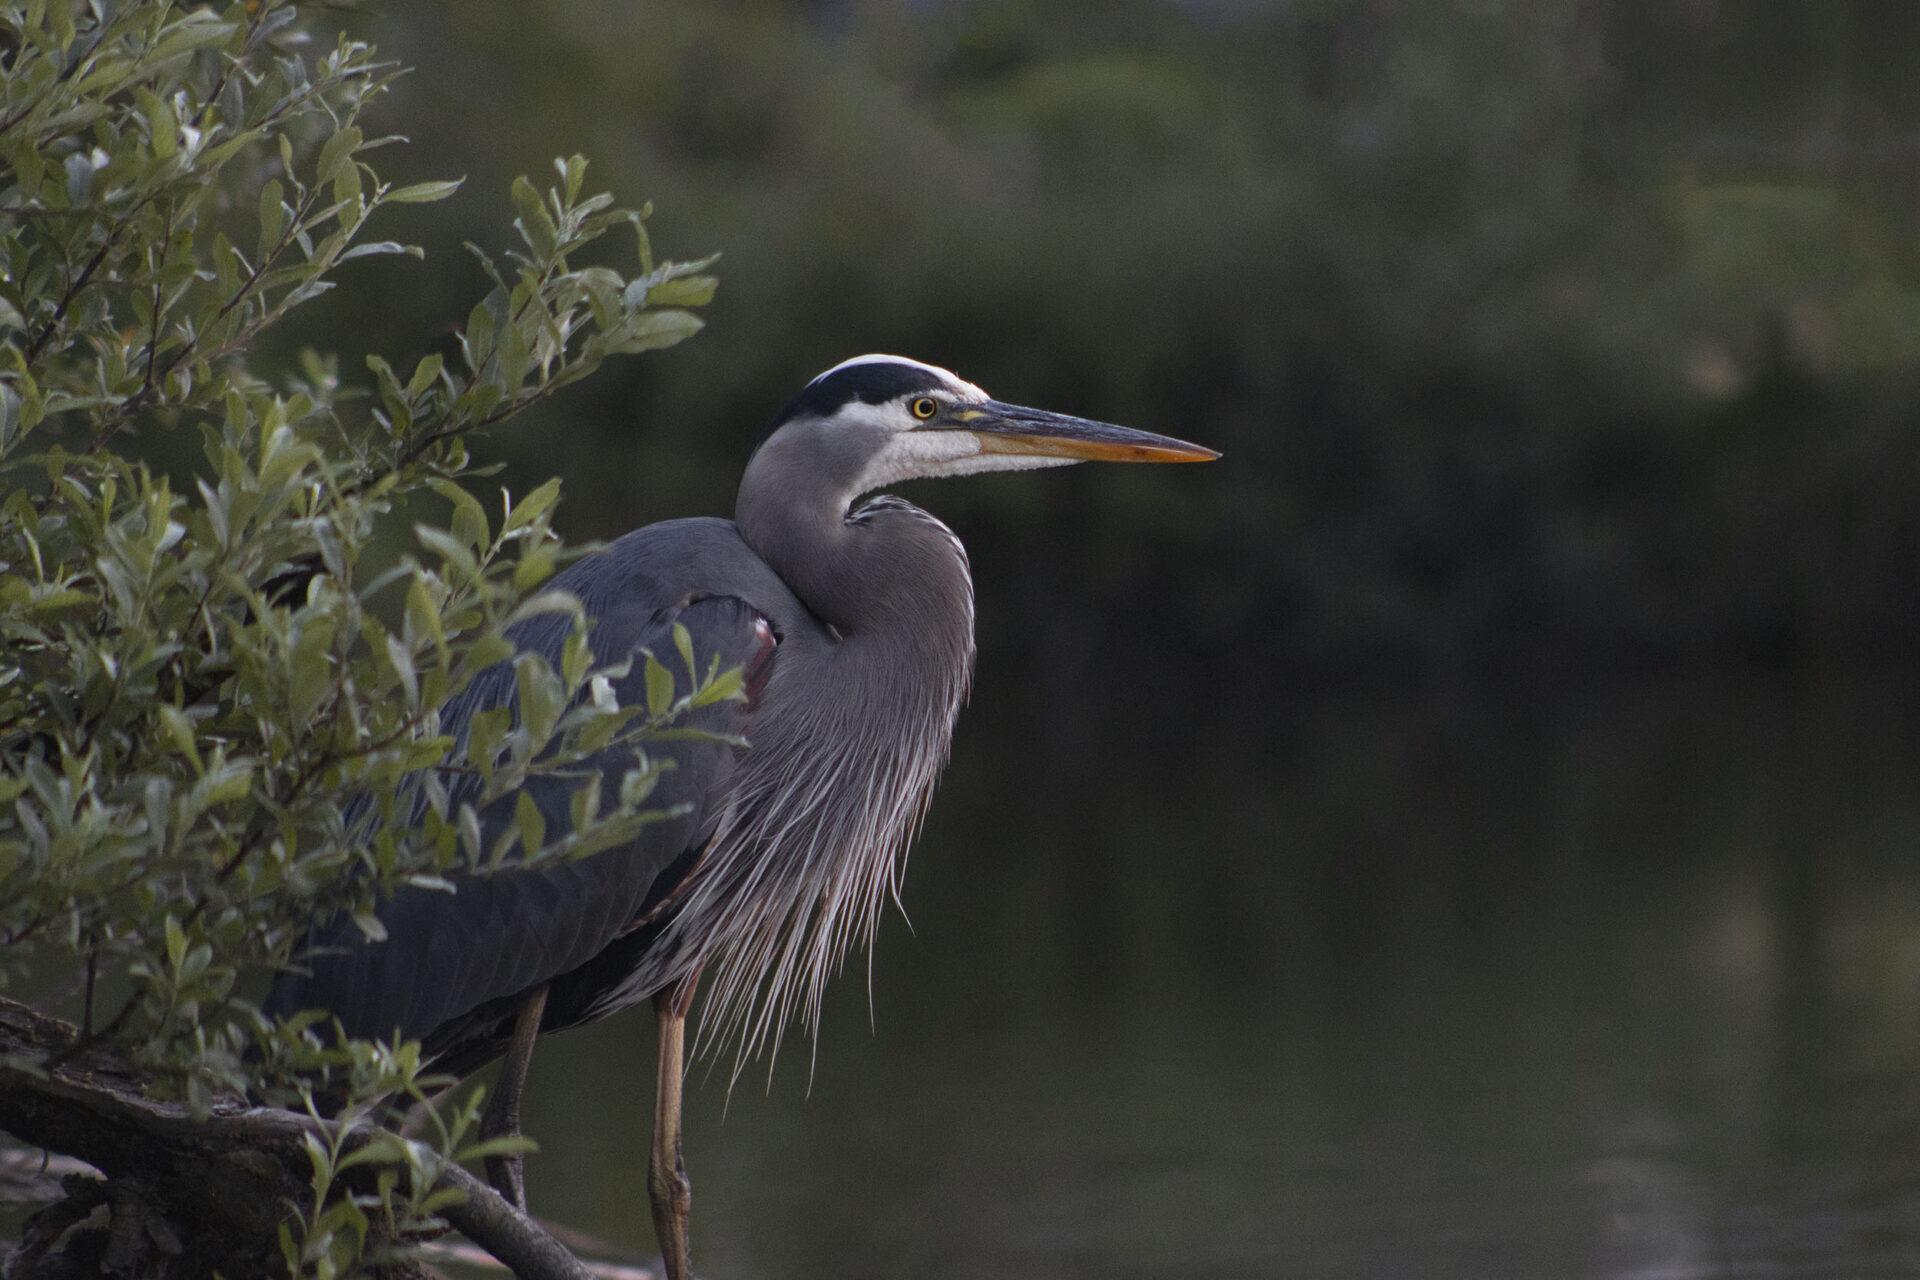 Great Blue Heron, July 1, 2021